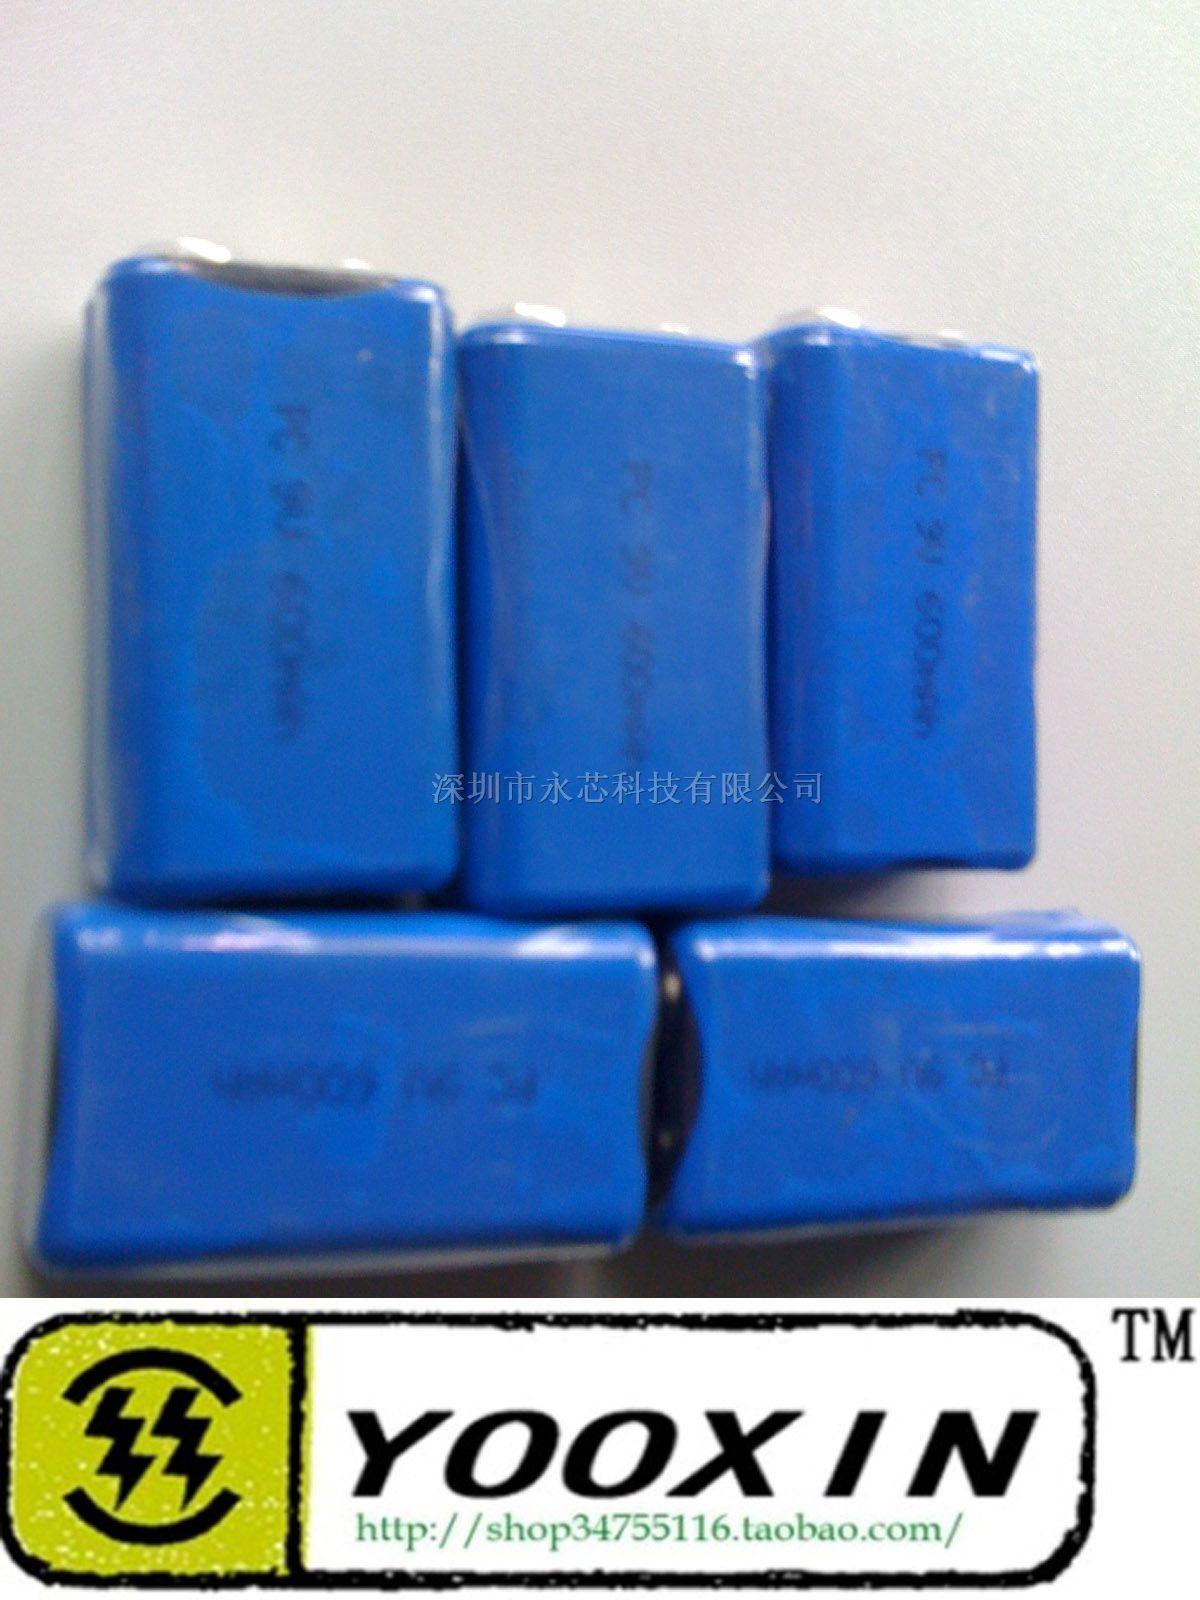 9v锂电池可充电锂电池650mah麦克风6f22 循环1000次图片